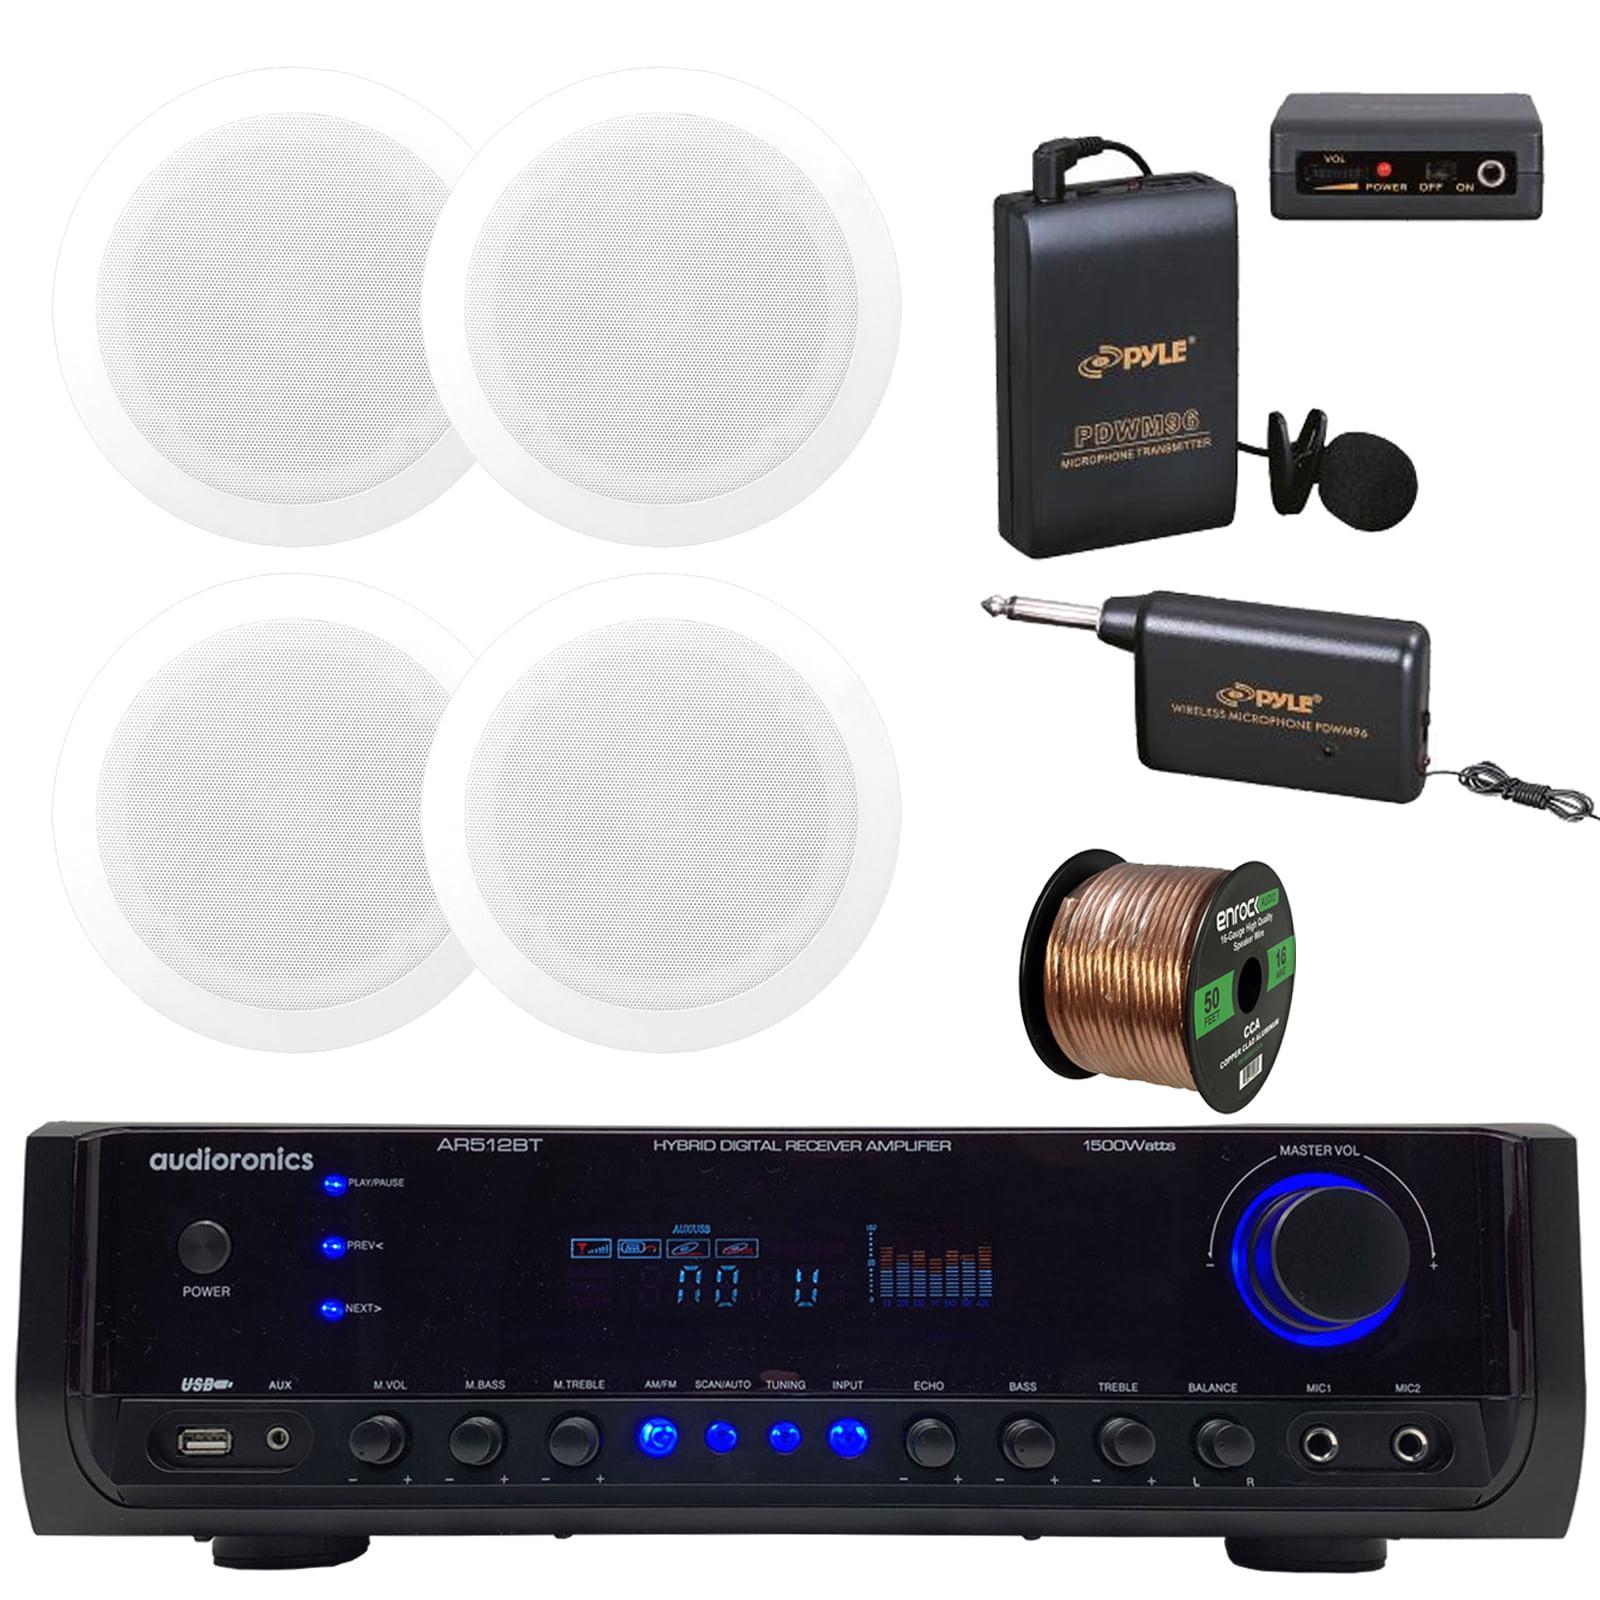 Audioronics 1500 Watt Hybrid Digital Stereo Receiver